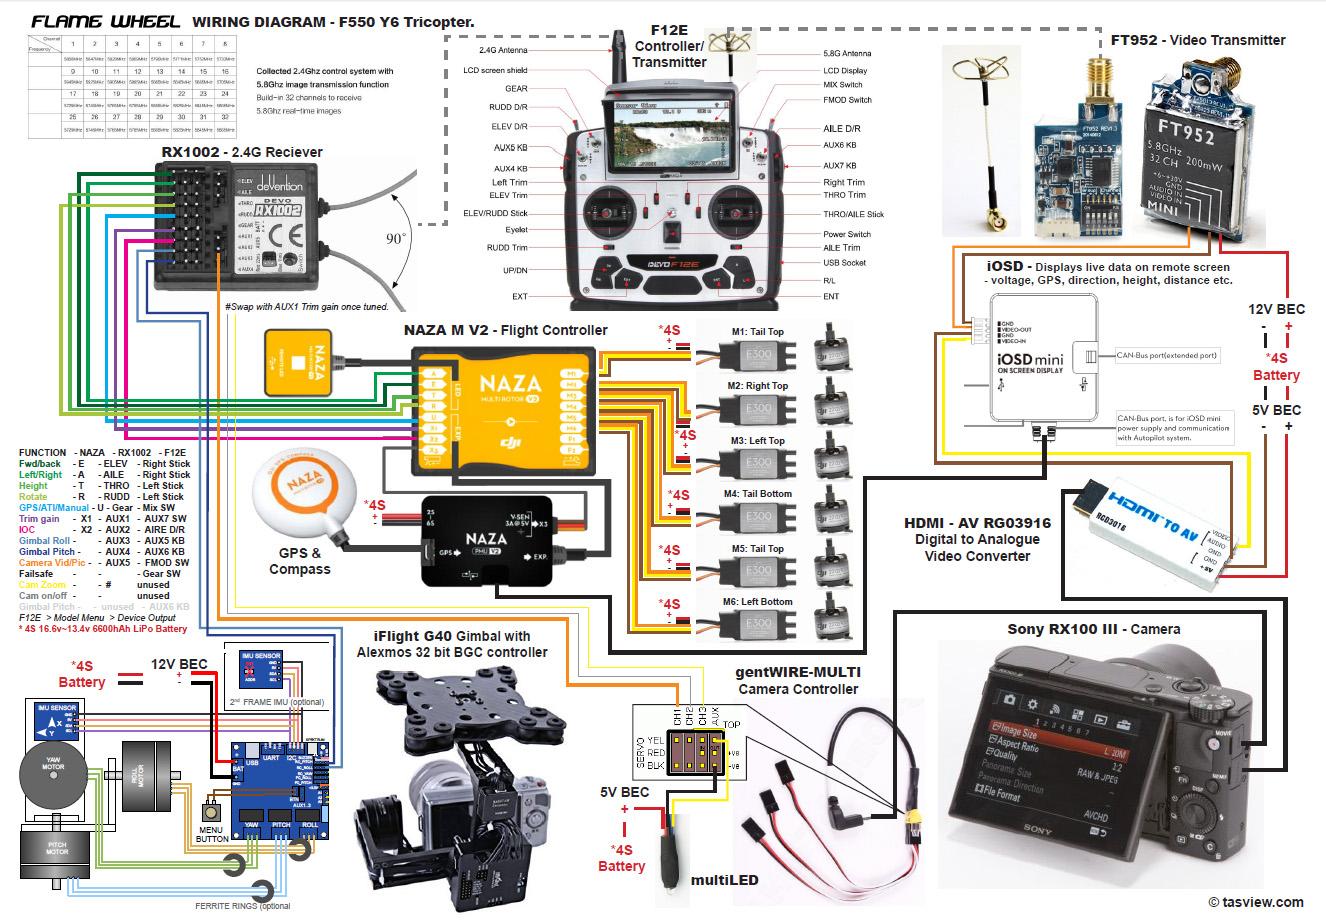 medium resolution of phantom wiring diagram wiring diagram third level gopro wiring diagram dji phantom 2 wiring diagram motor